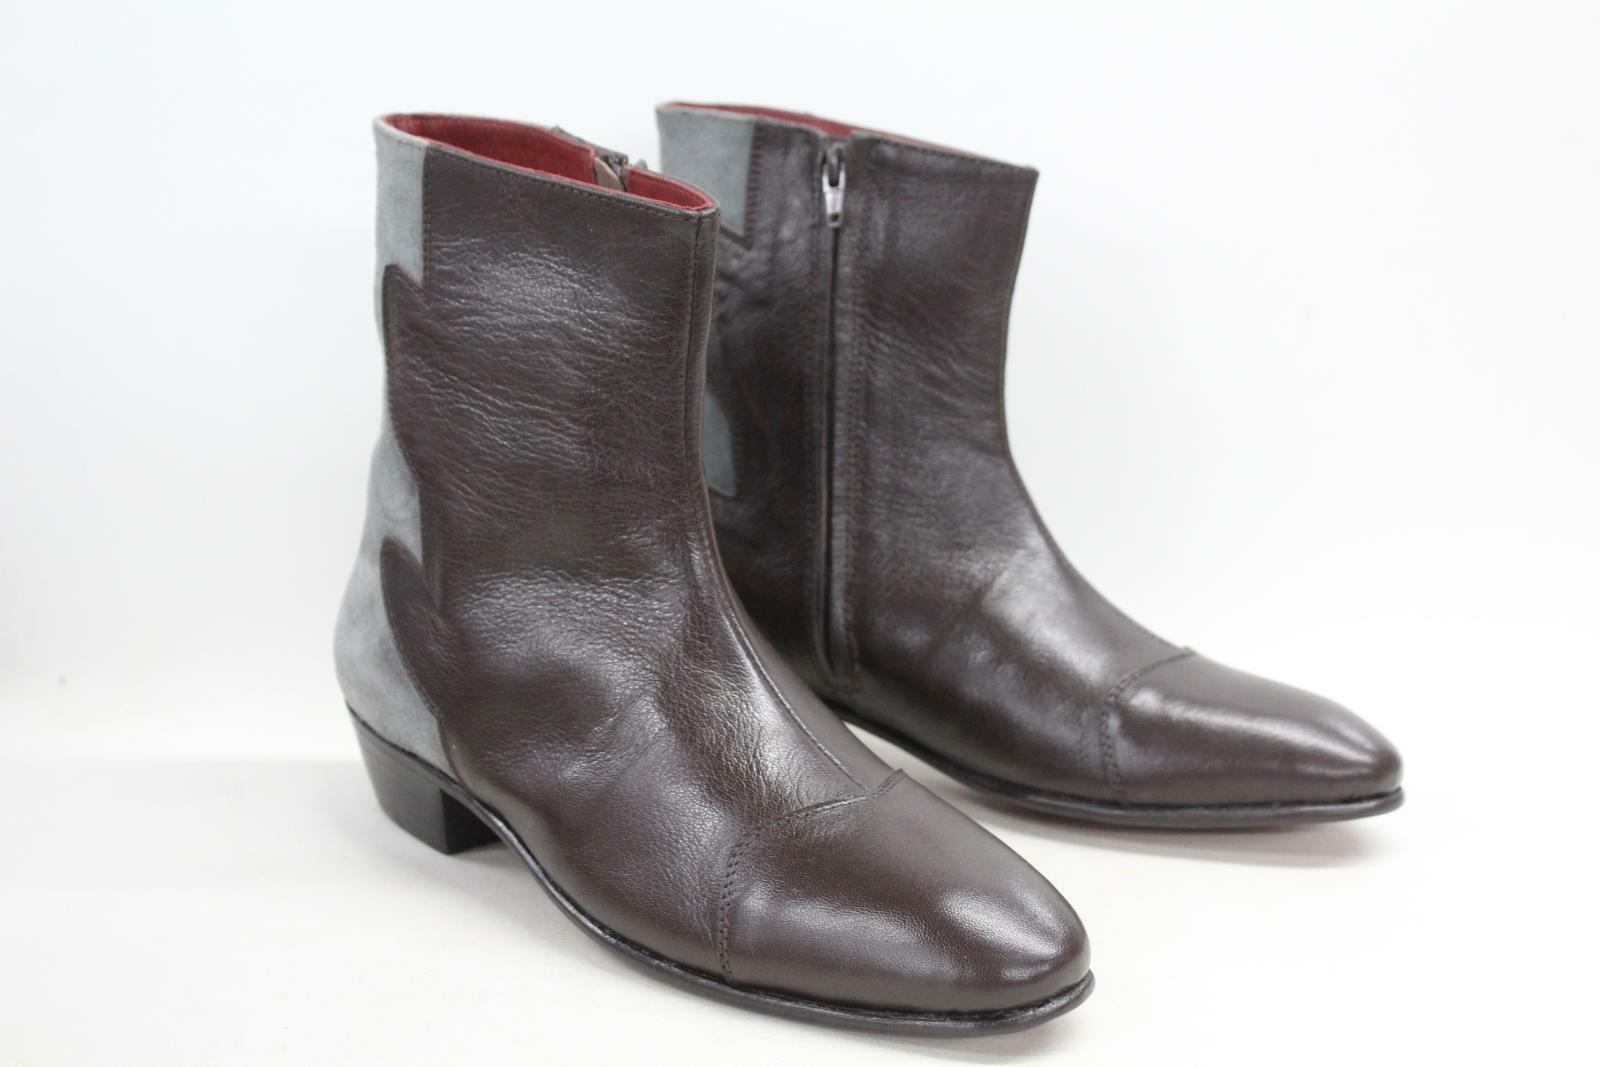 DISTINCT ADVANTAGE Men's Eccentric Brown Leather Pull On Ankle Boots UK8 BNIB